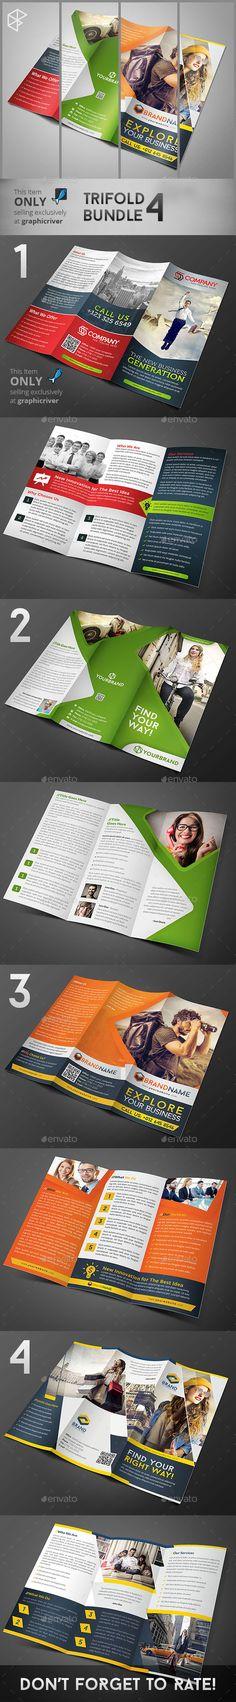 Trifold Brochure Templates Bundle 4 #brochure Download: http://graphicriver.net/item/trifold-bundle-4/11326720?ref=ksioks